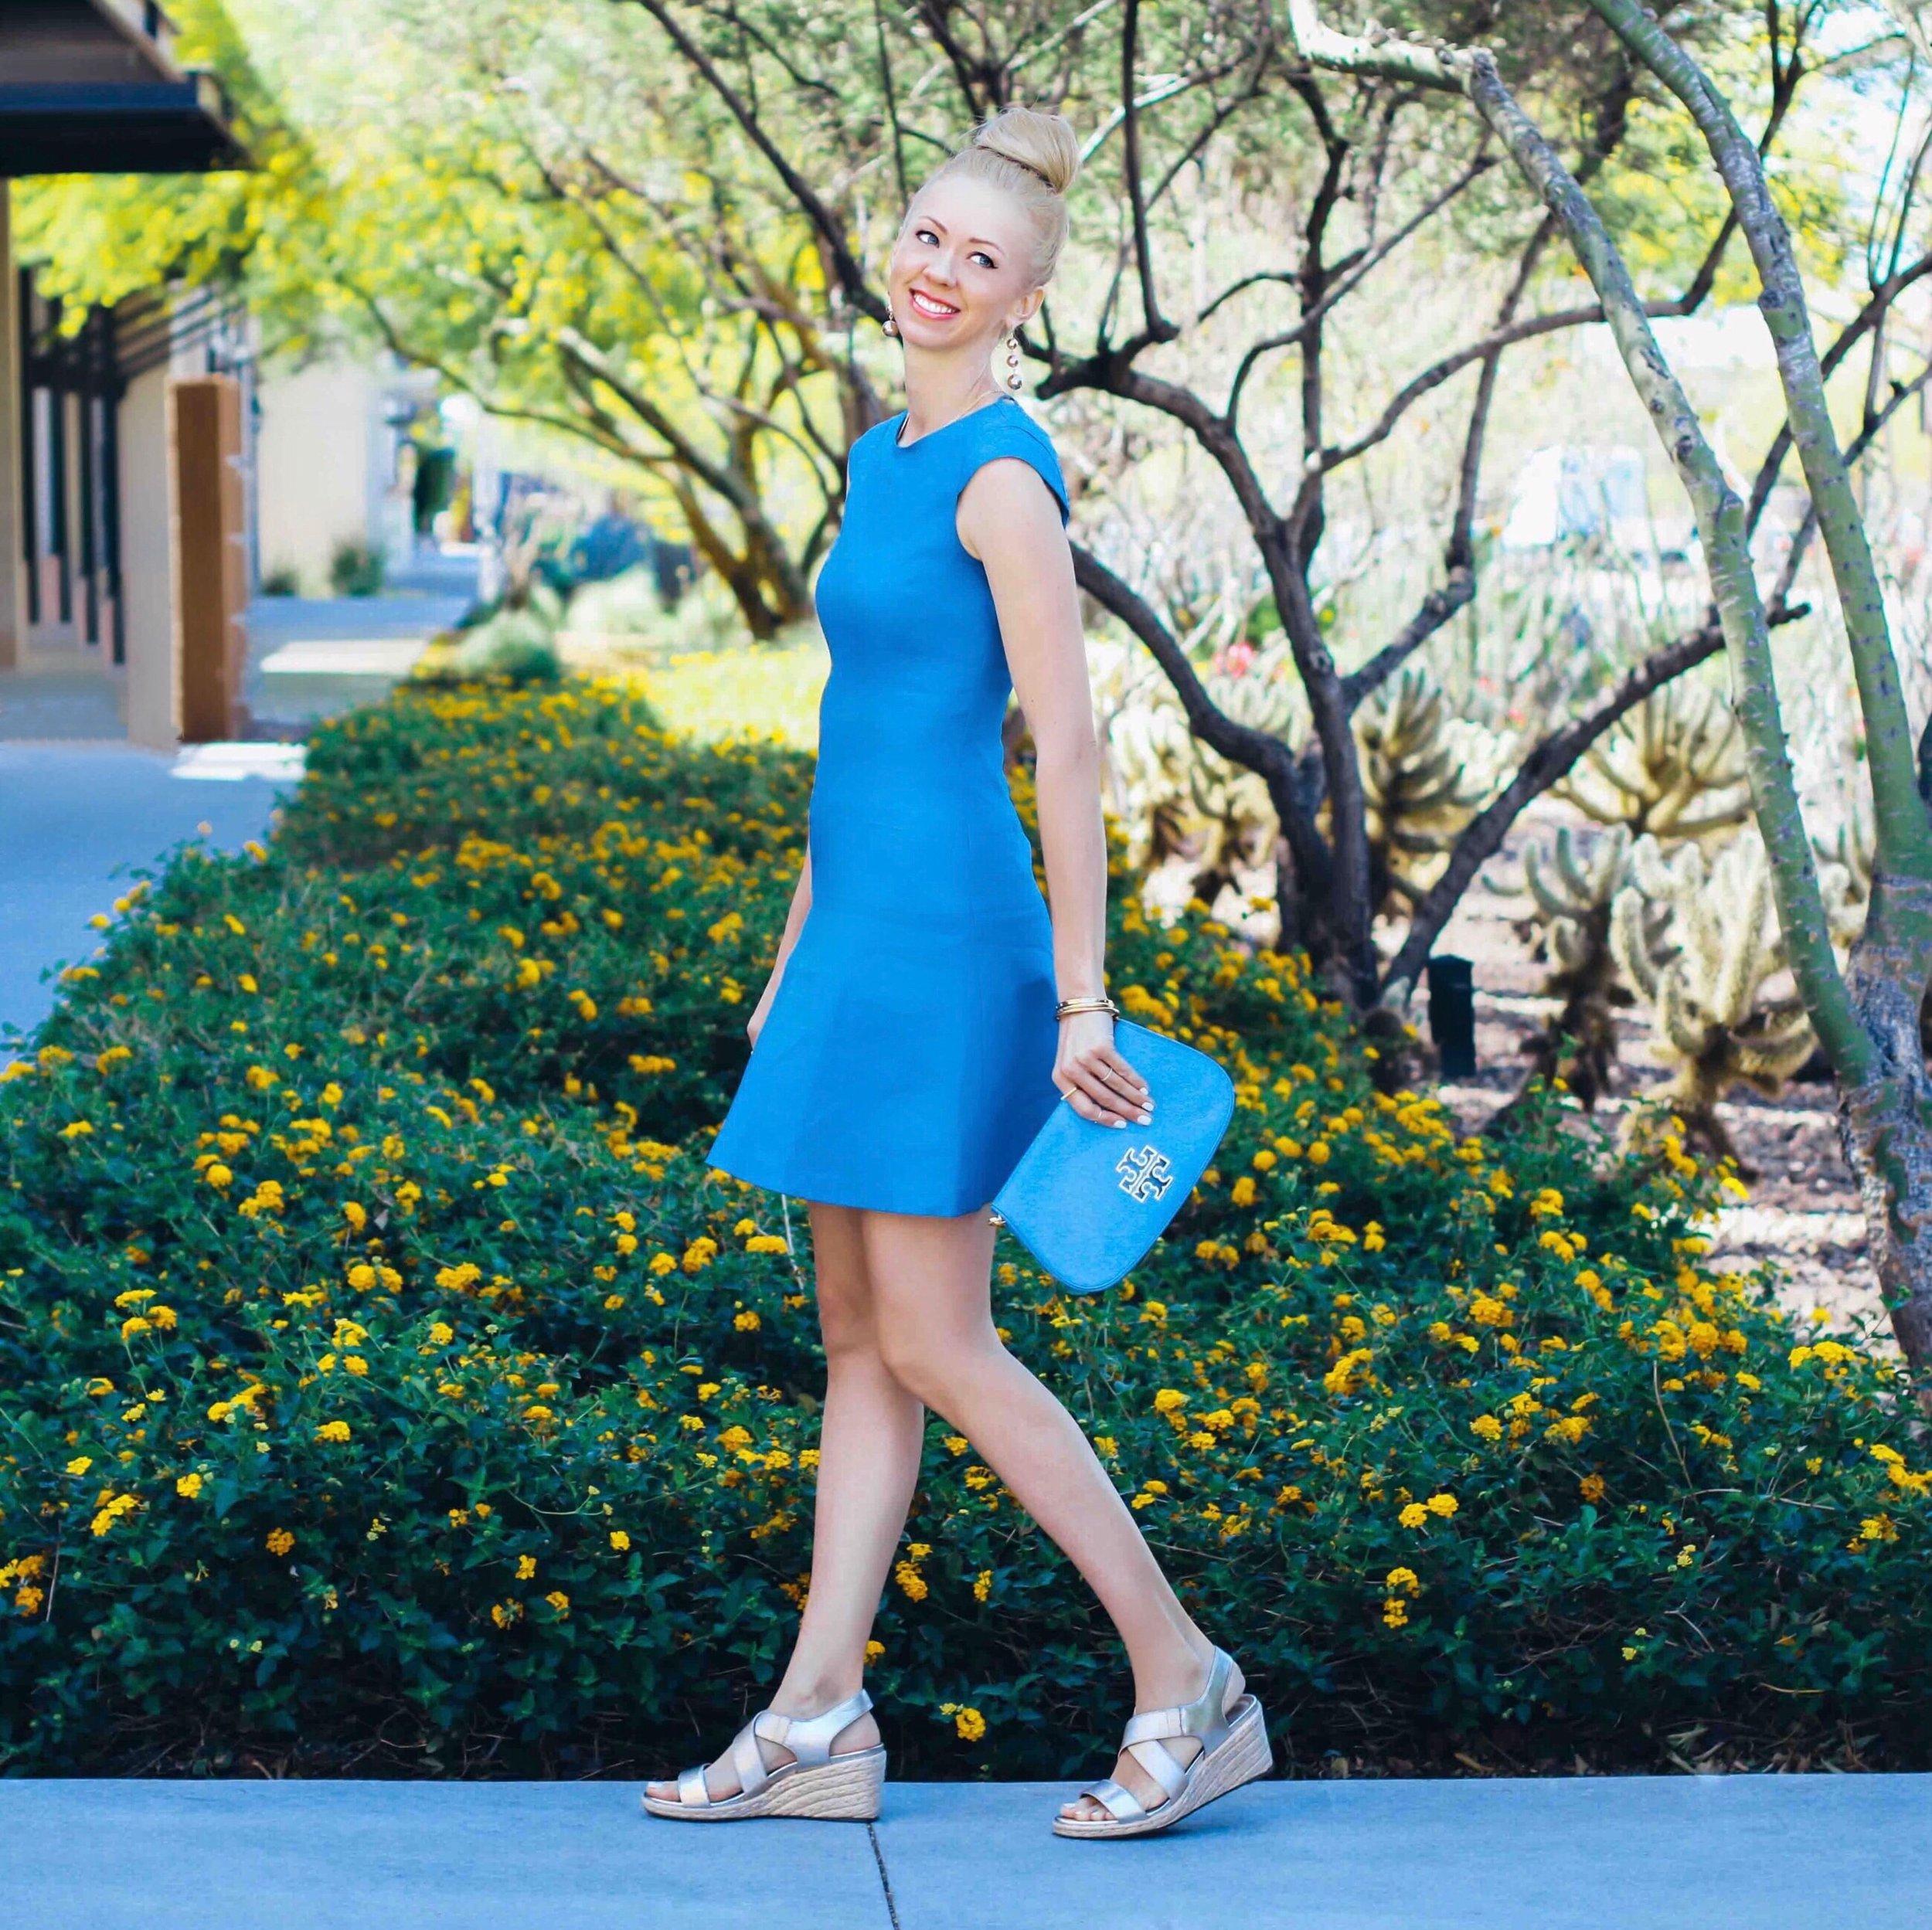 vionic-ainsleigh-wedge-espadrilles-gold-blue-linen-dress-antonio-melani-dillards.jpg